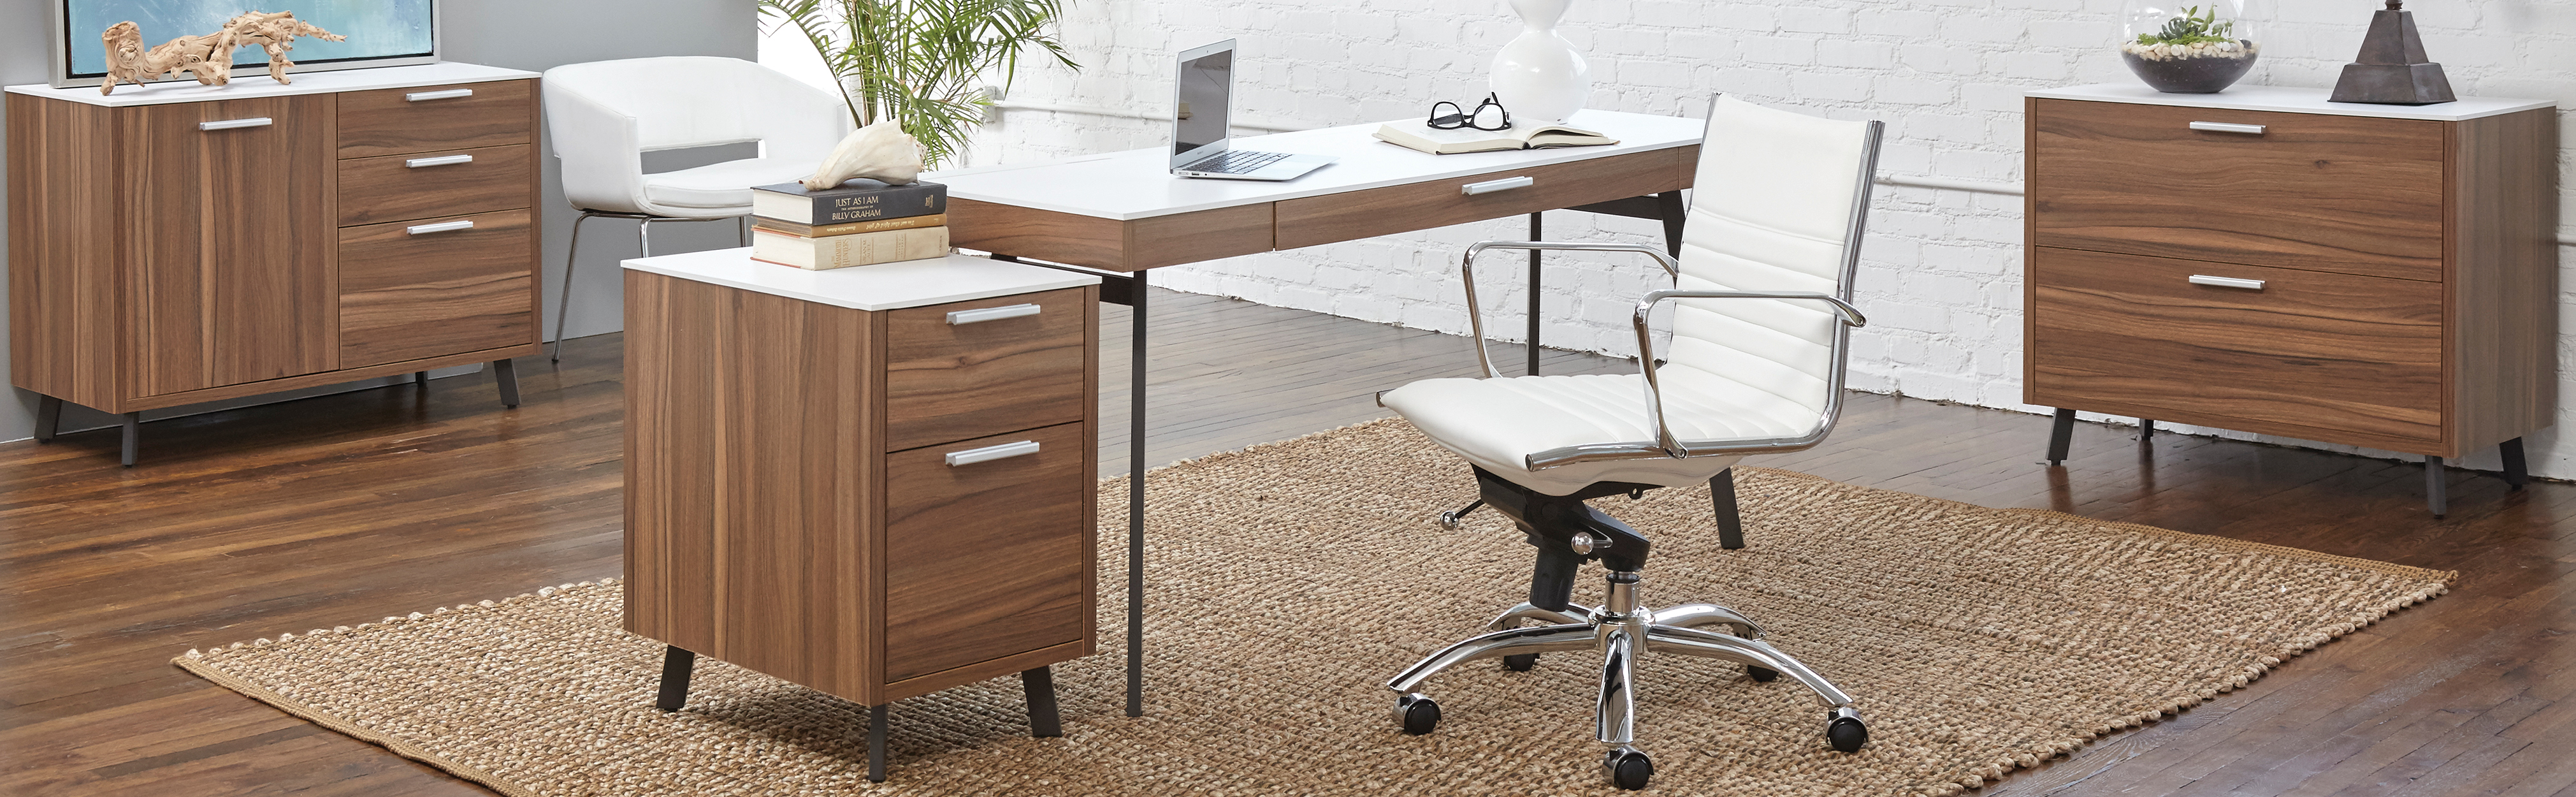 Inspired Furniture For Inspired Work